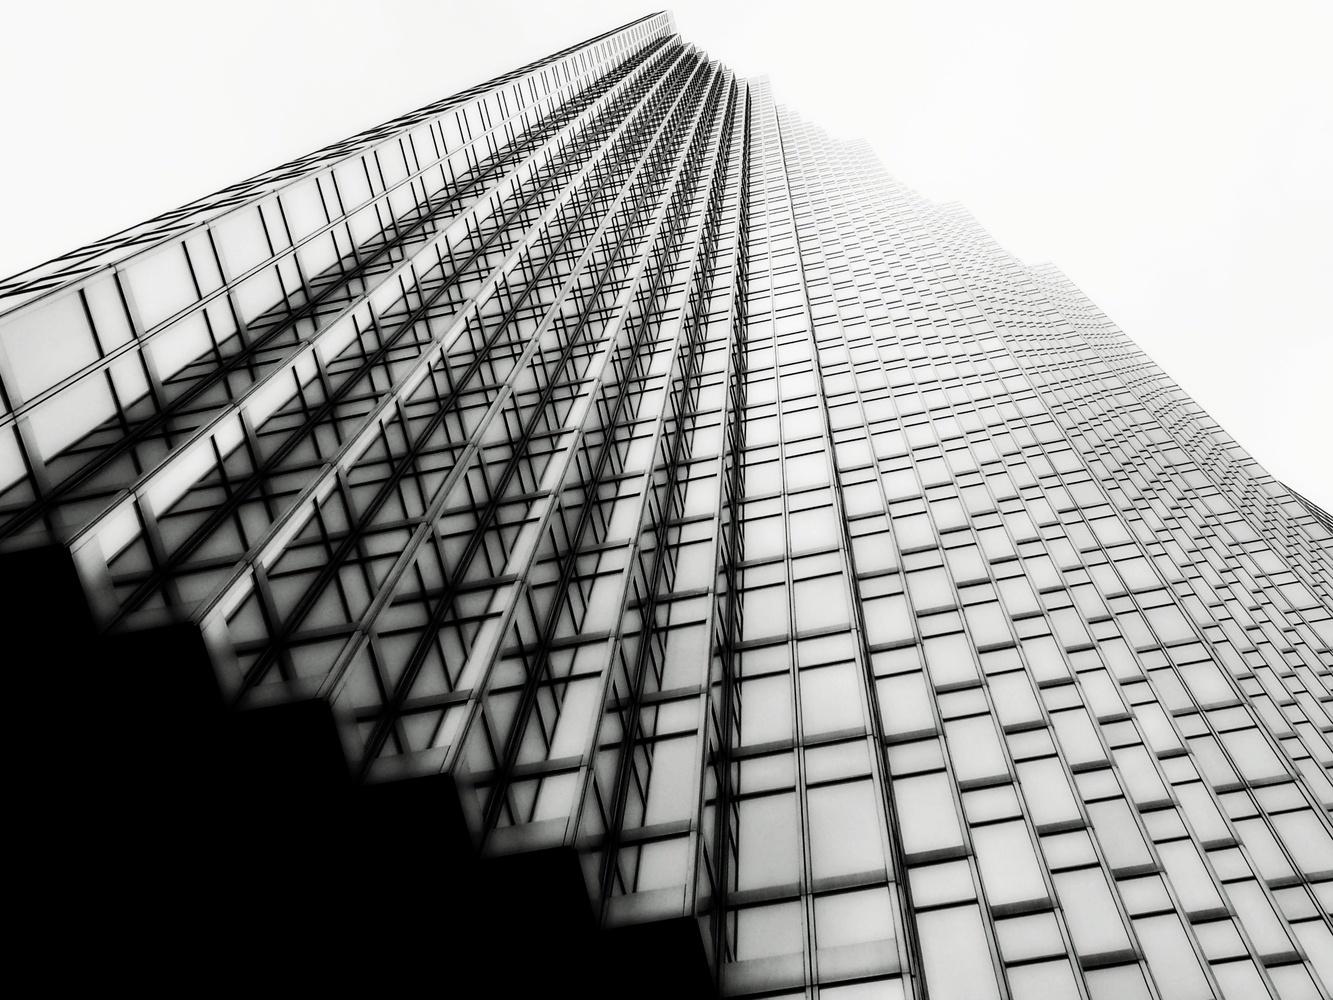 Skyscraper by Gail Jordan